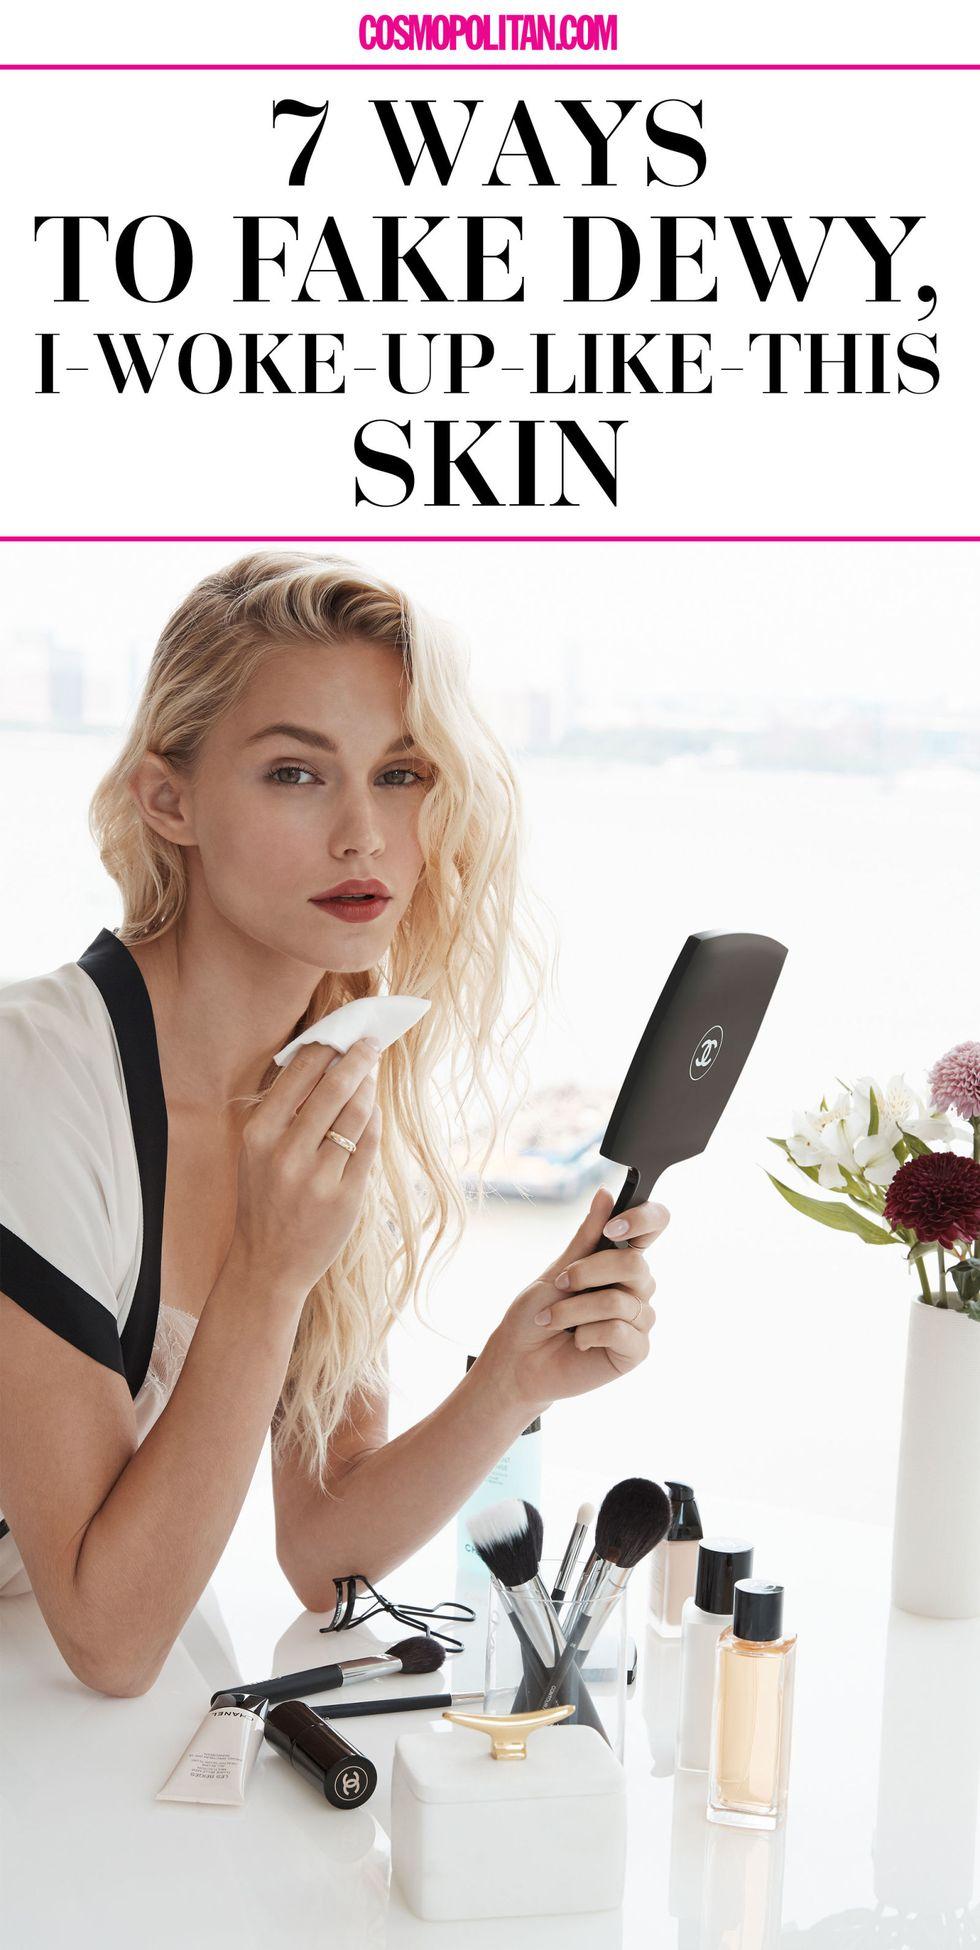 7 Ways to Fake Dewy, I-Woke-Up-Like-This Skin